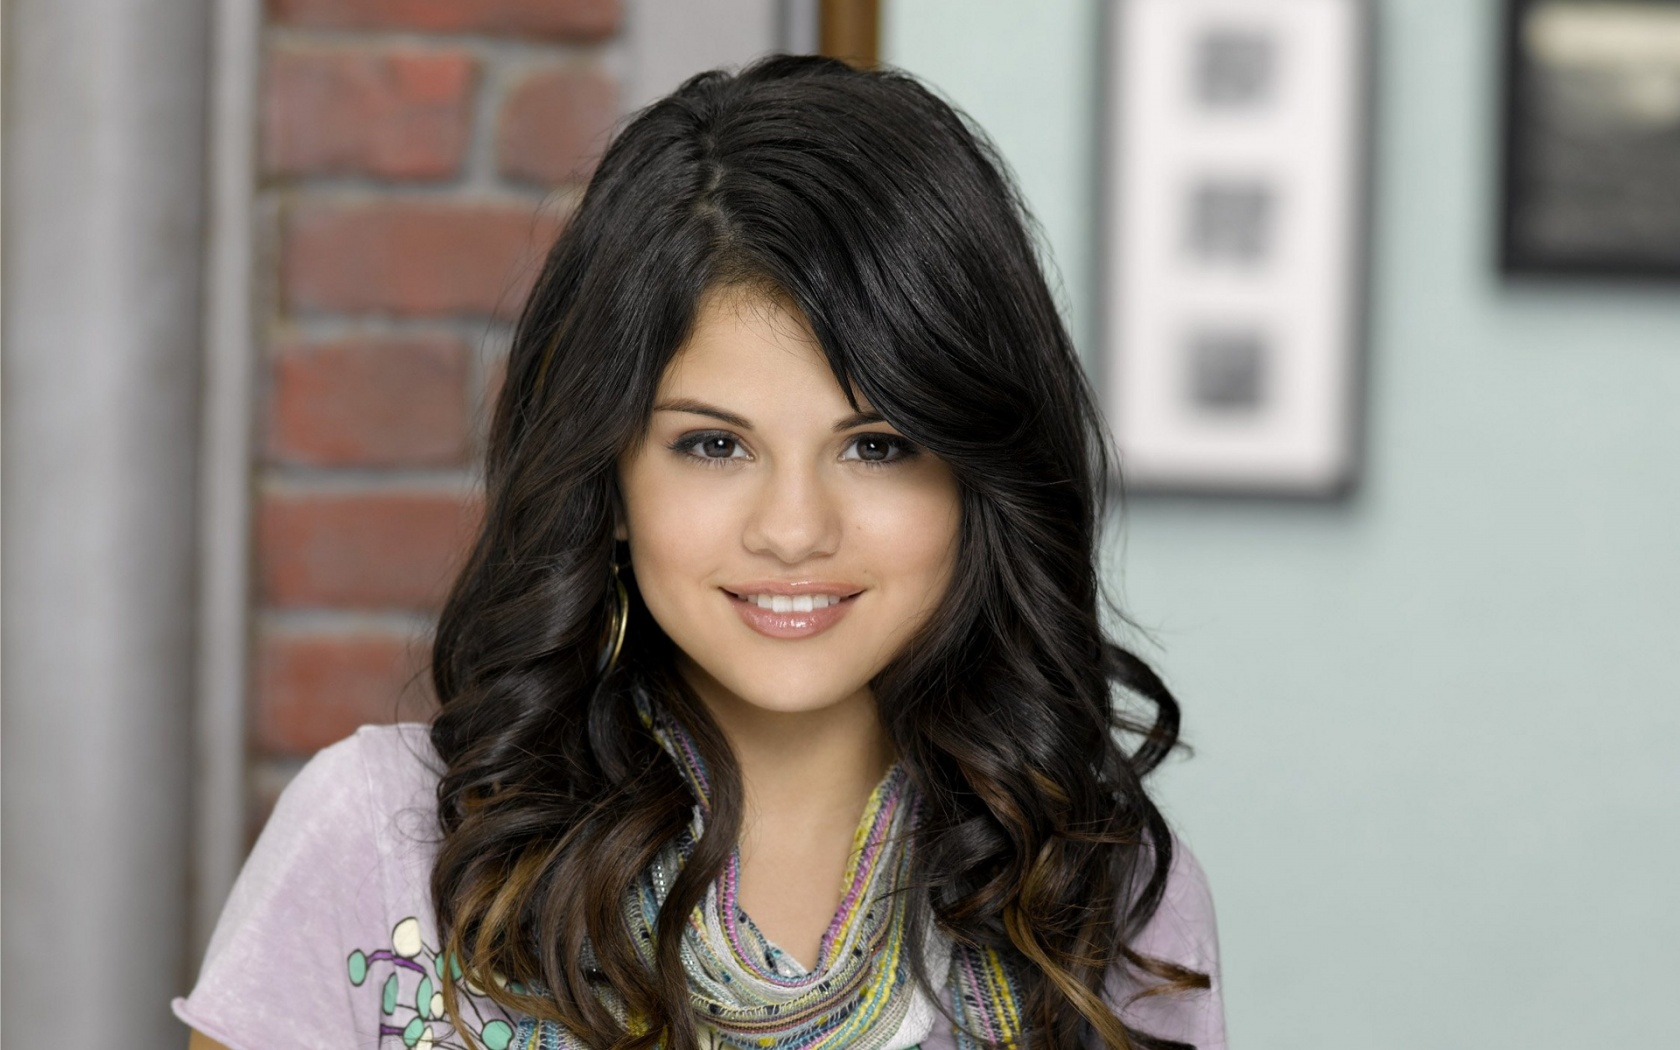 STARS WALLPAPER Selena Gomez HD Wallpapers Free Download 1680x1050